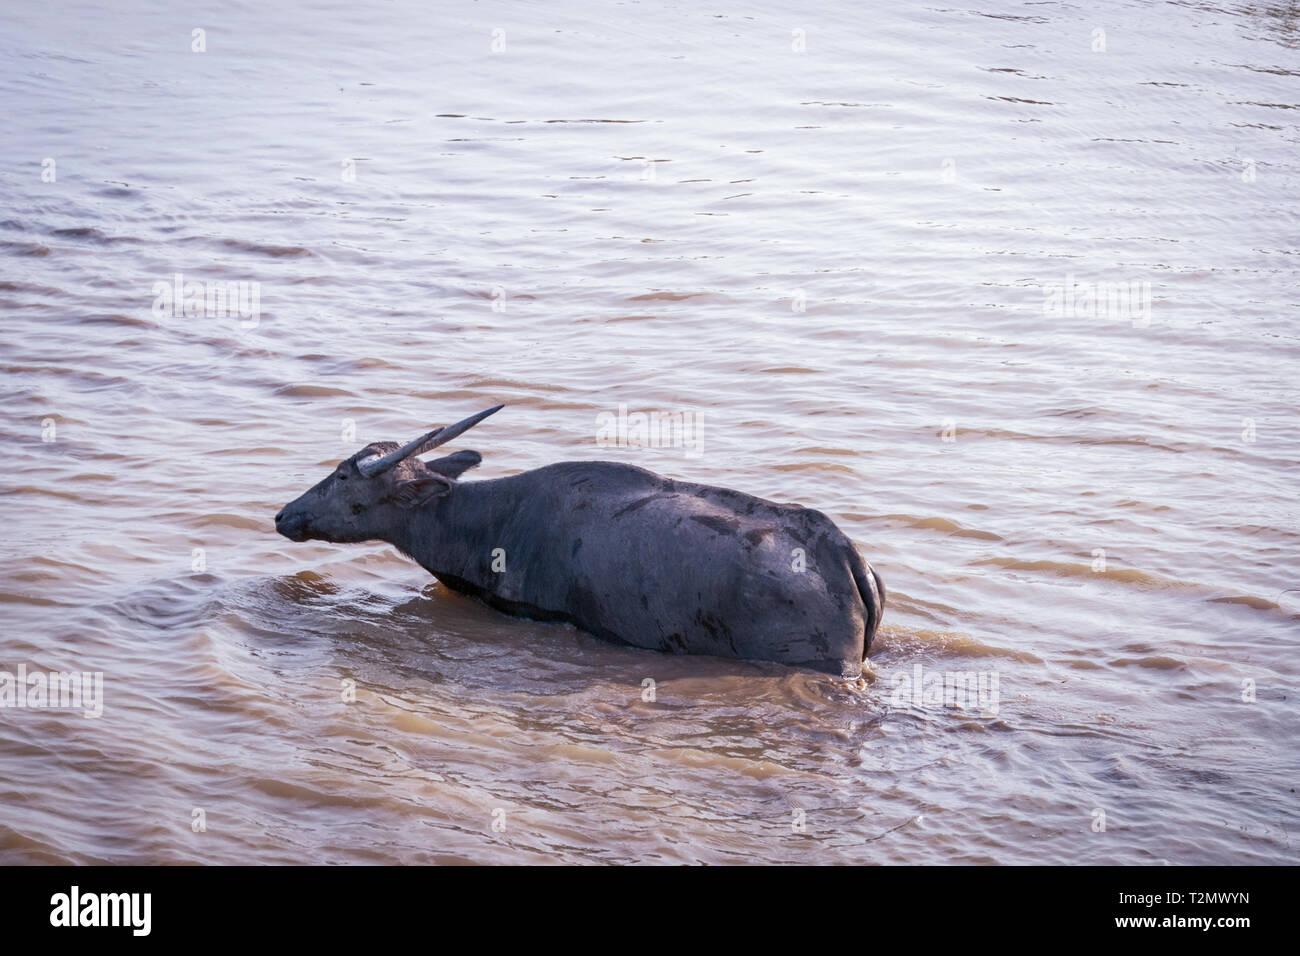 Thailand Lake Stock Photos & Thailand Lake Stock Images